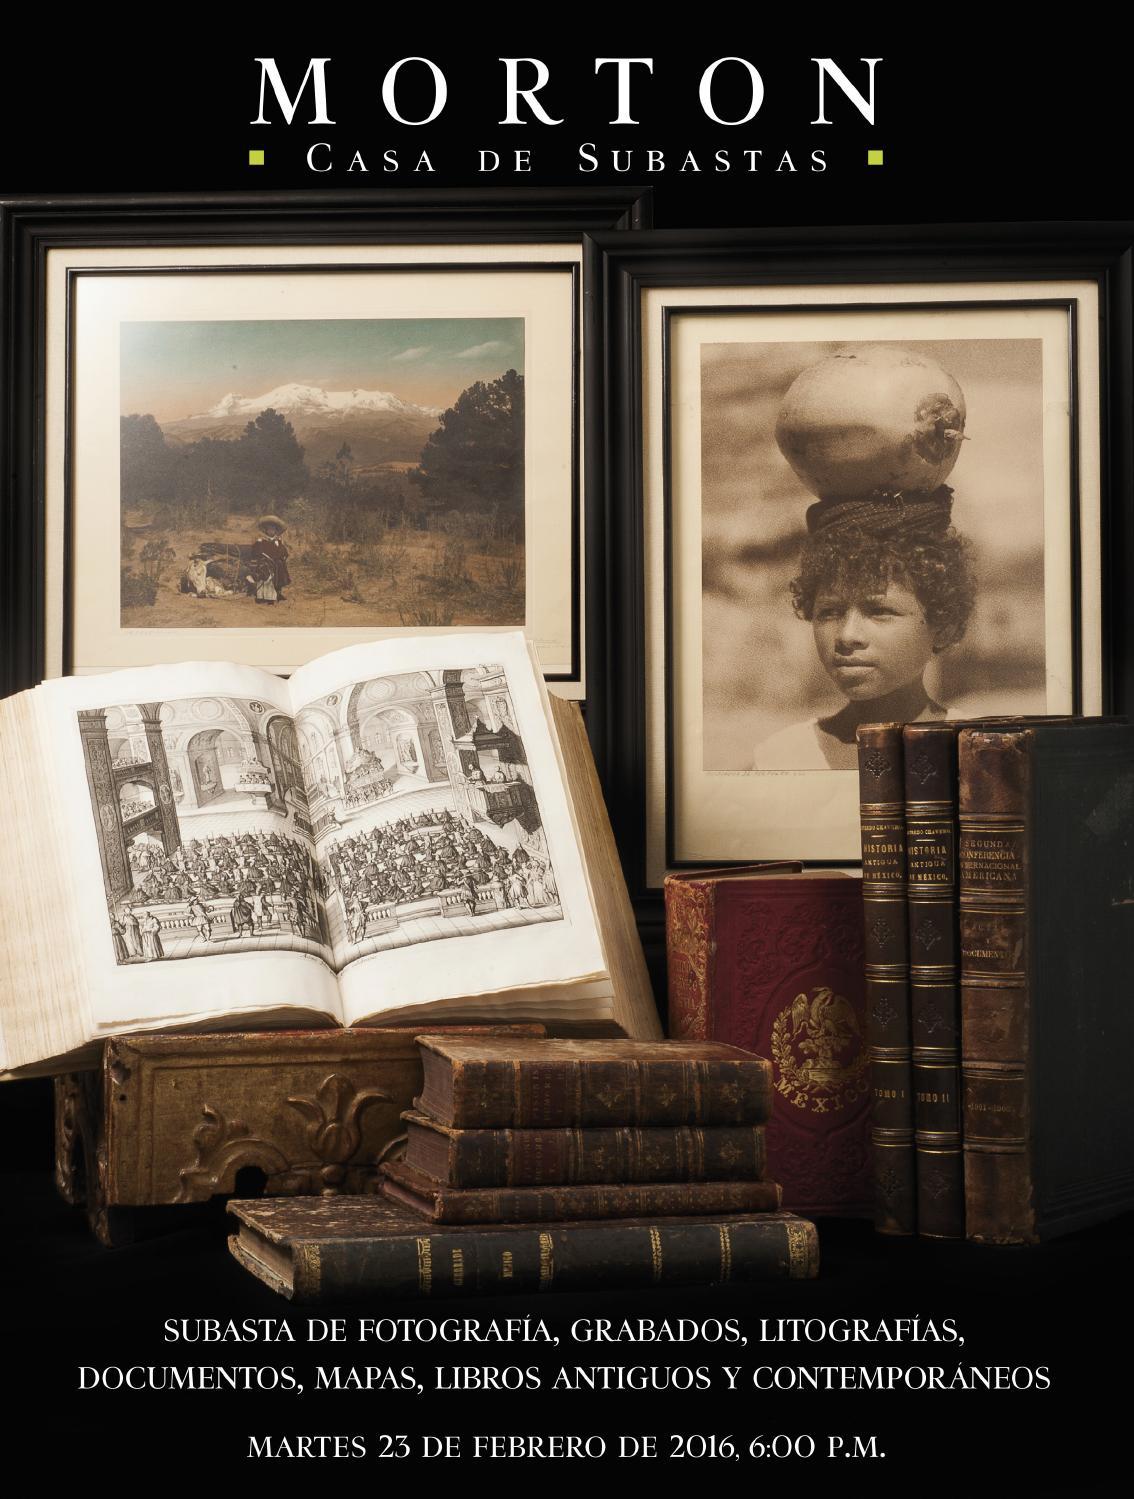 Subasta De Libros Y Documentos By Morton Subastas Issuu # Muebles Goitia Tijuana